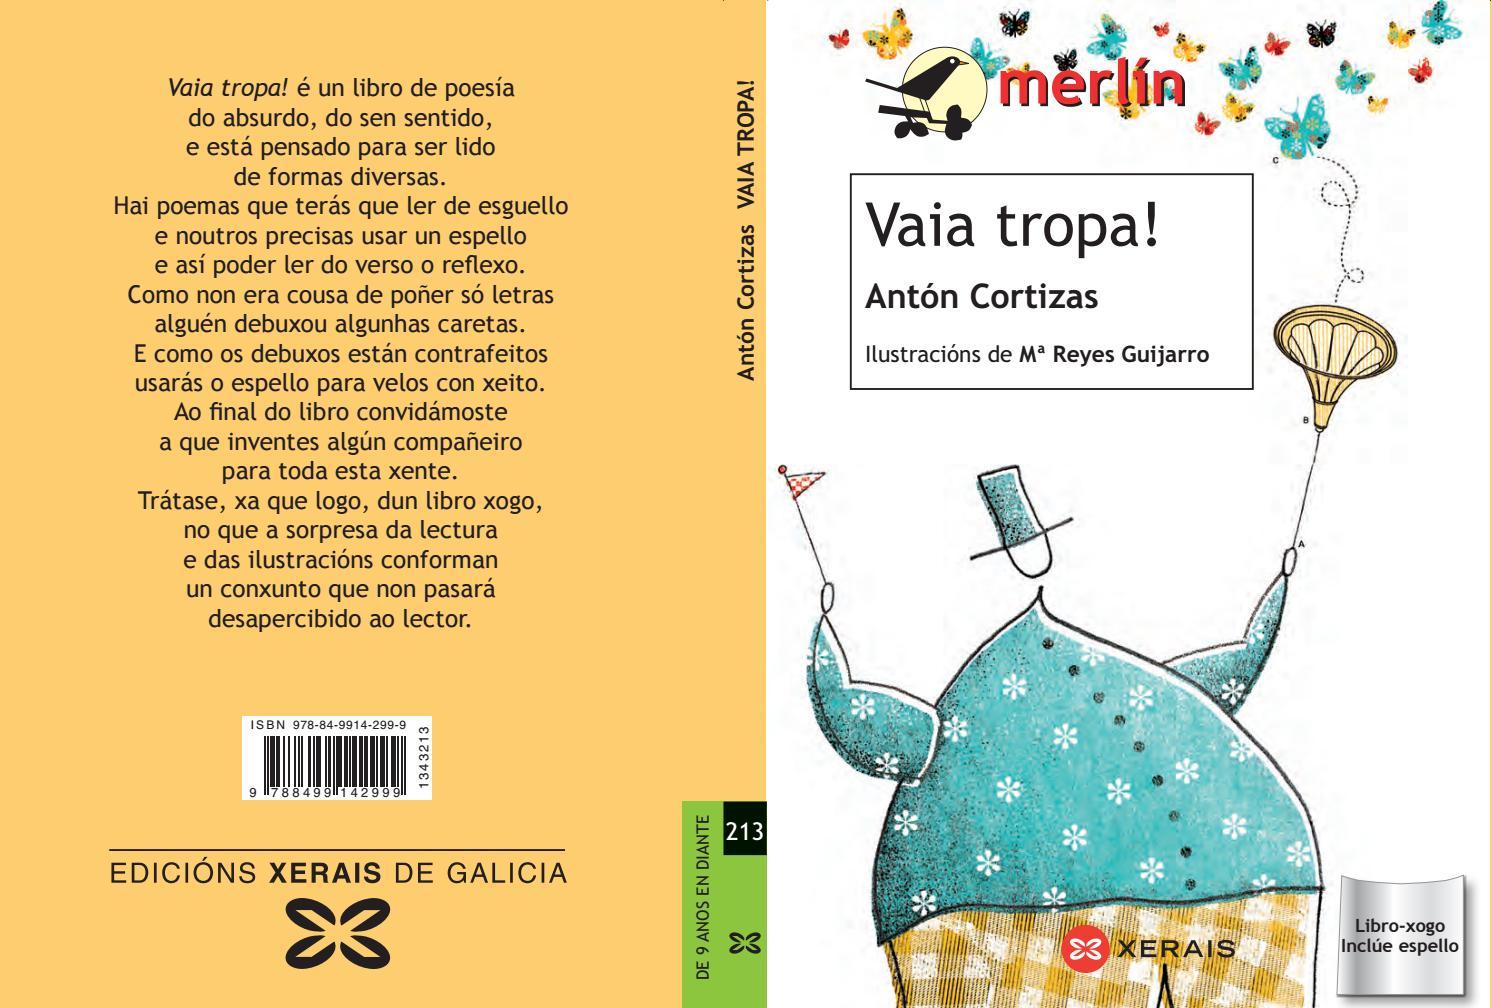 Vaia tropa!», de Antón Cortizas by Xerais - issuu